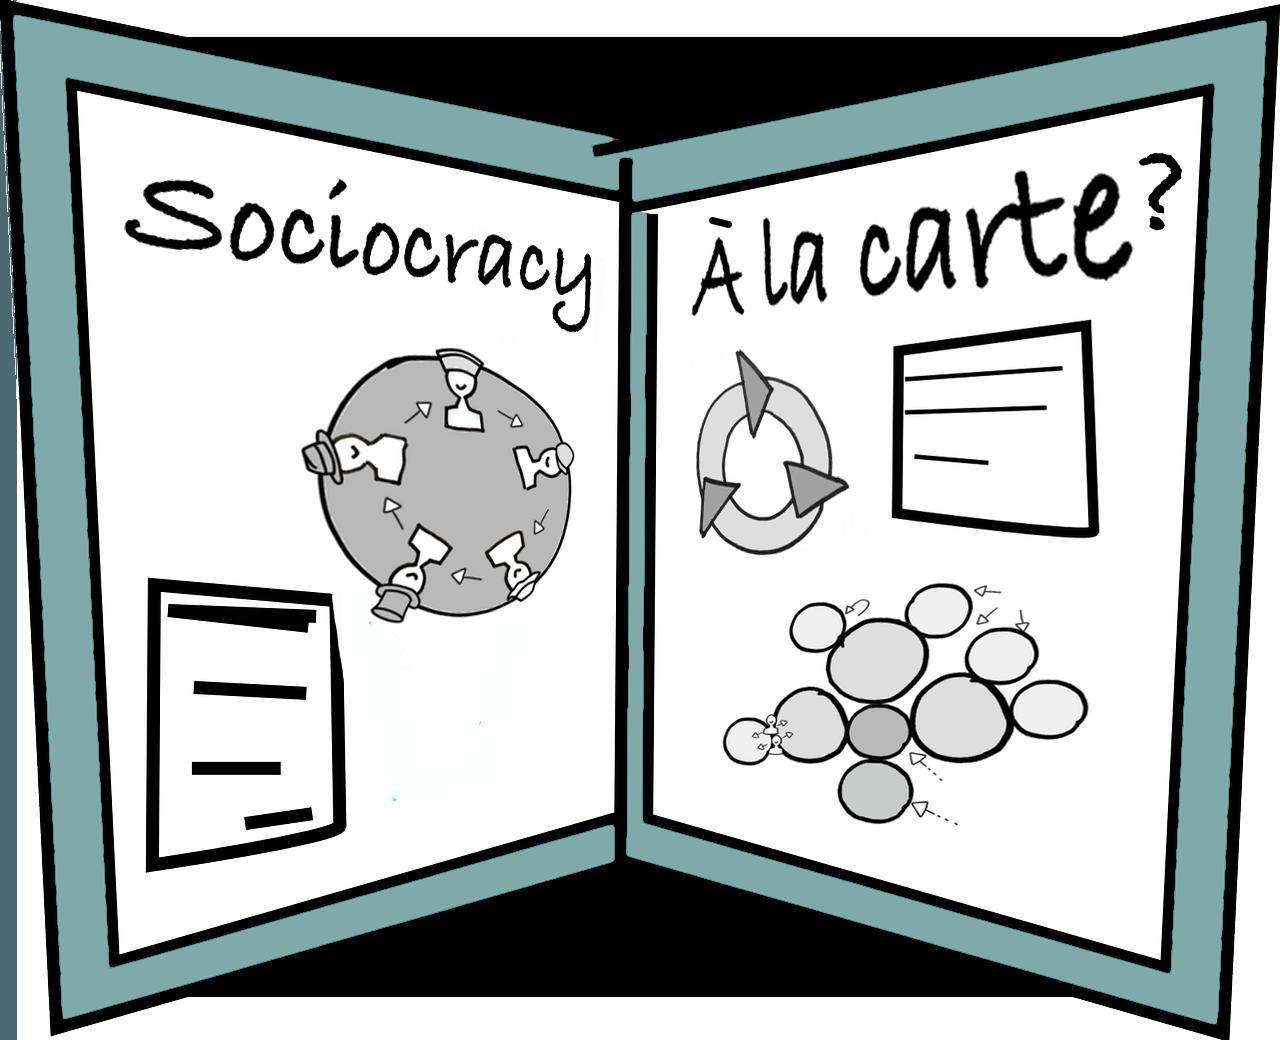 Graphic: Sociocracy A la carte